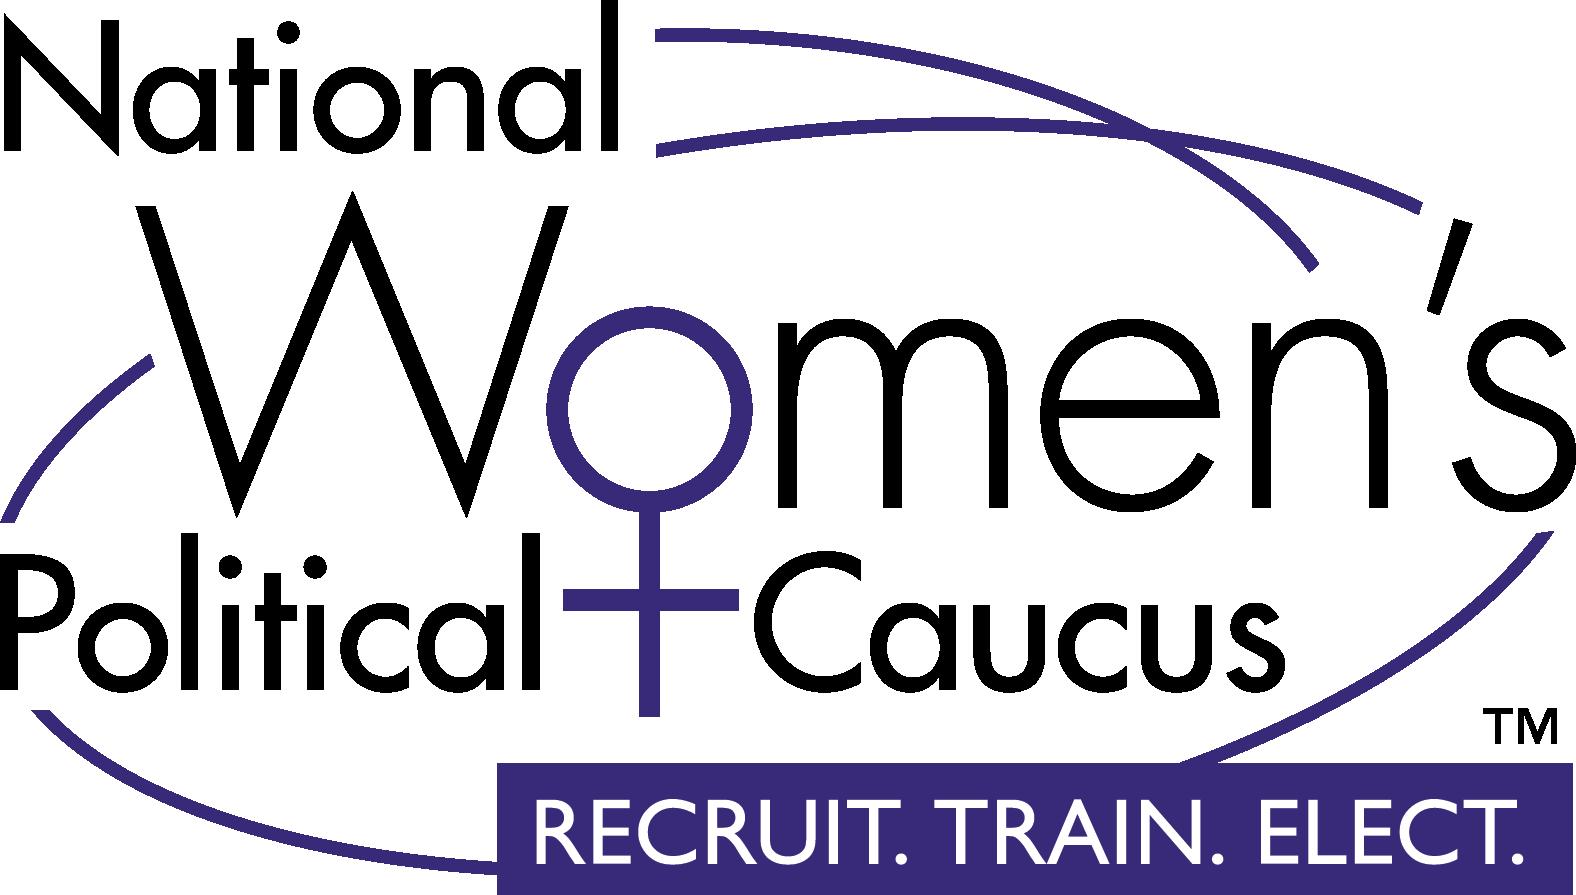 Women's Caucus Nwpc-logo-2 National Political